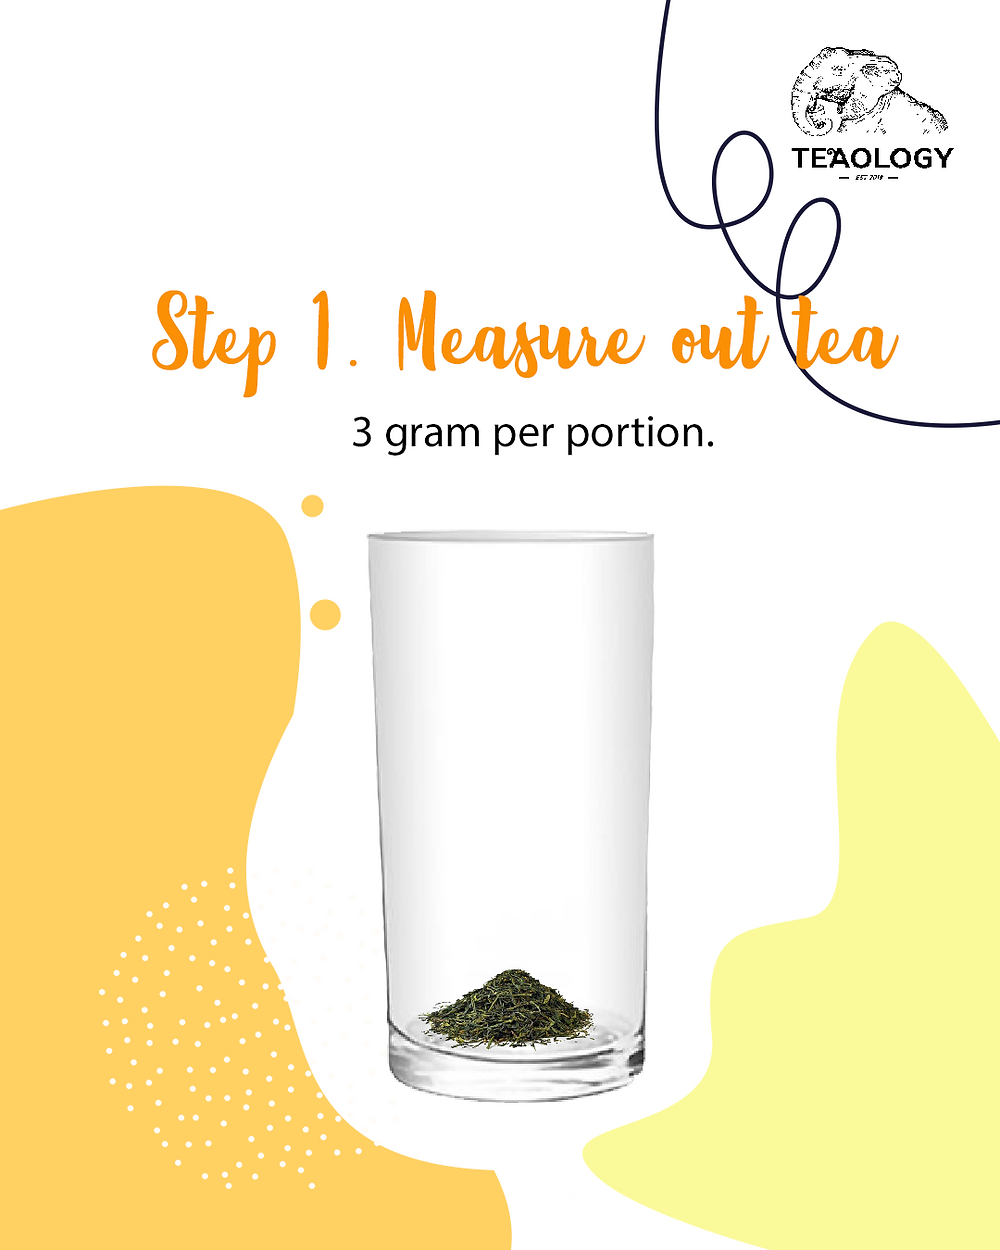 TeaOlogy - Step 1 to make mango boba at home to measure tea leaves